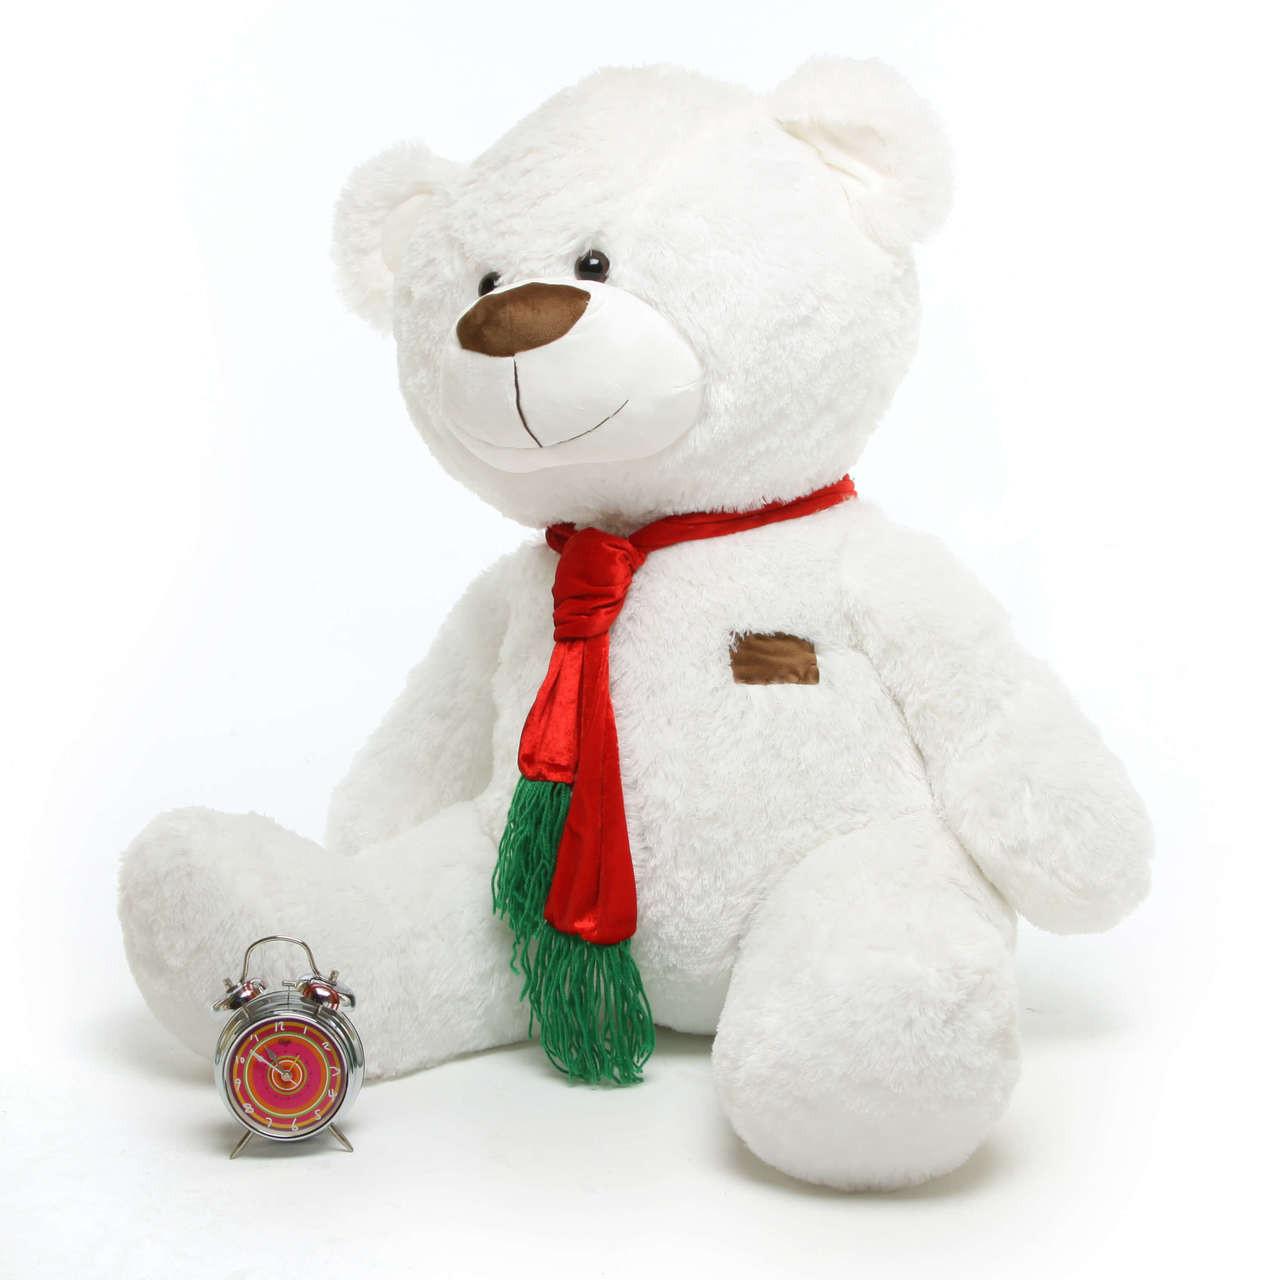 Waldo Holiday Shags white teddy bear 45in